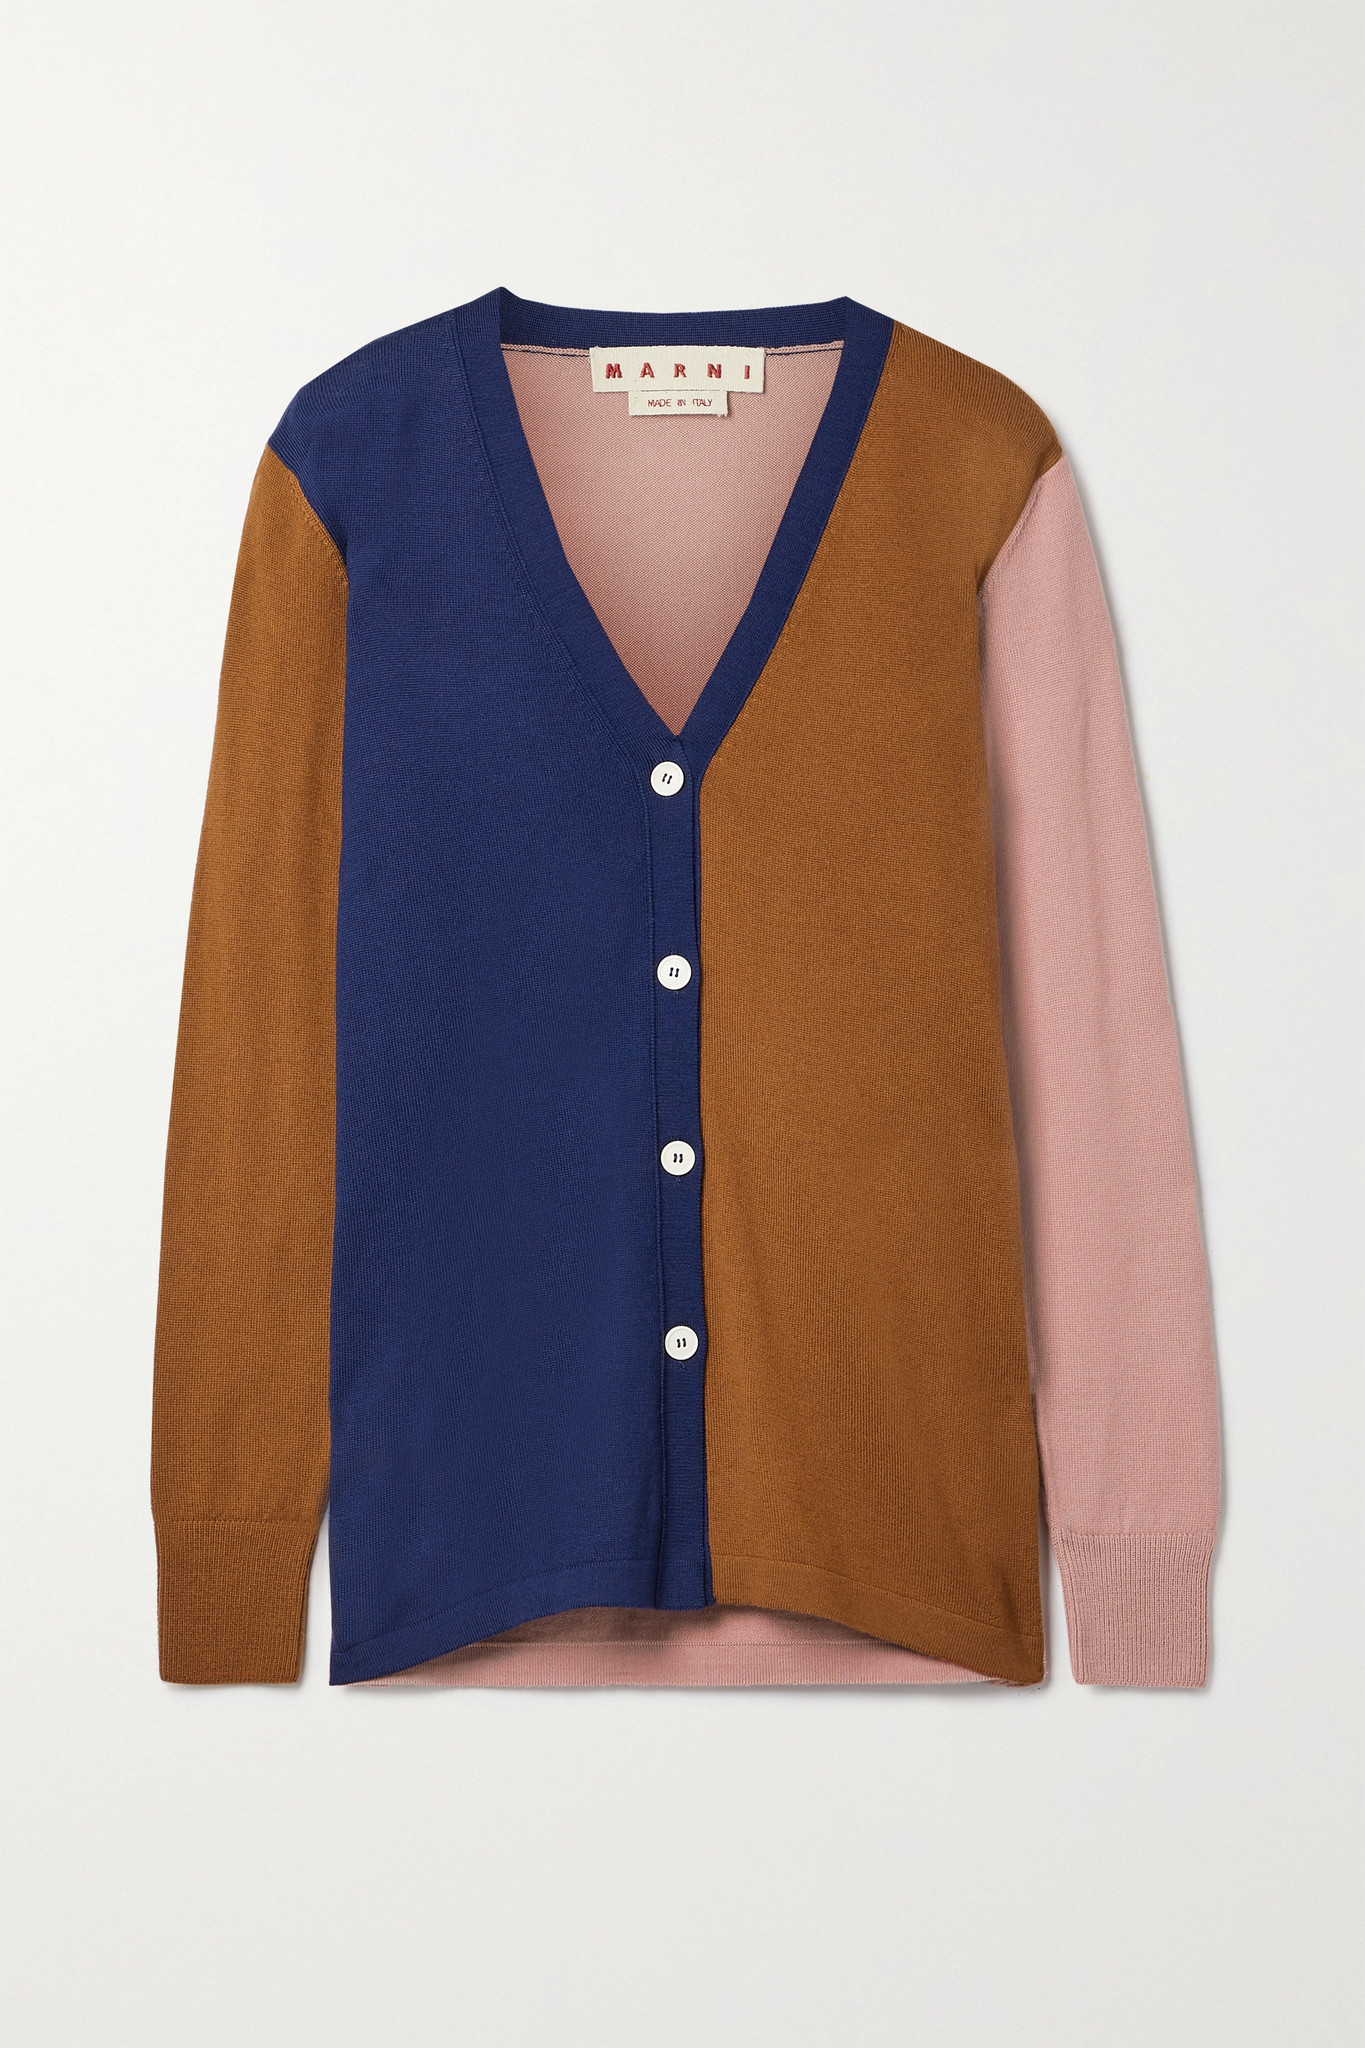 MARNI - Color-block Wool Cardigan - Blue - IT42